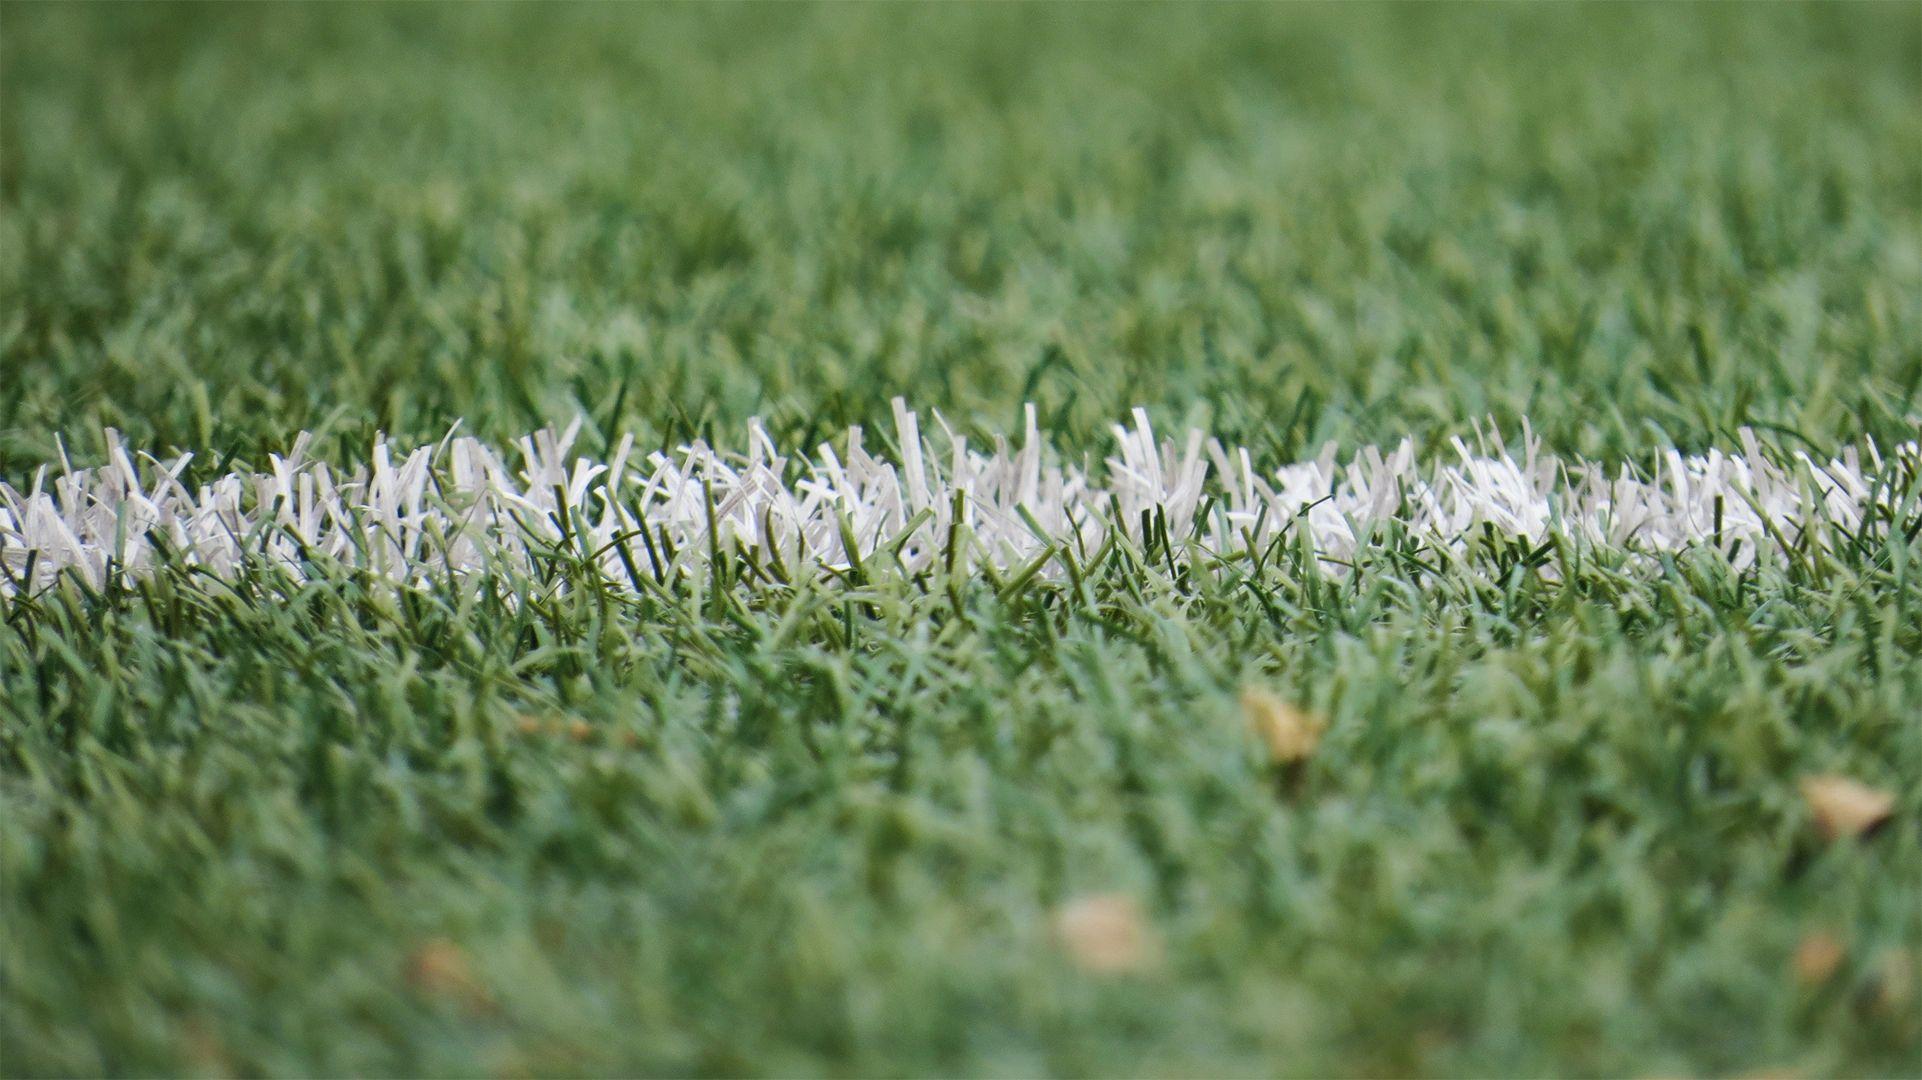 White sideline of a soccer field.